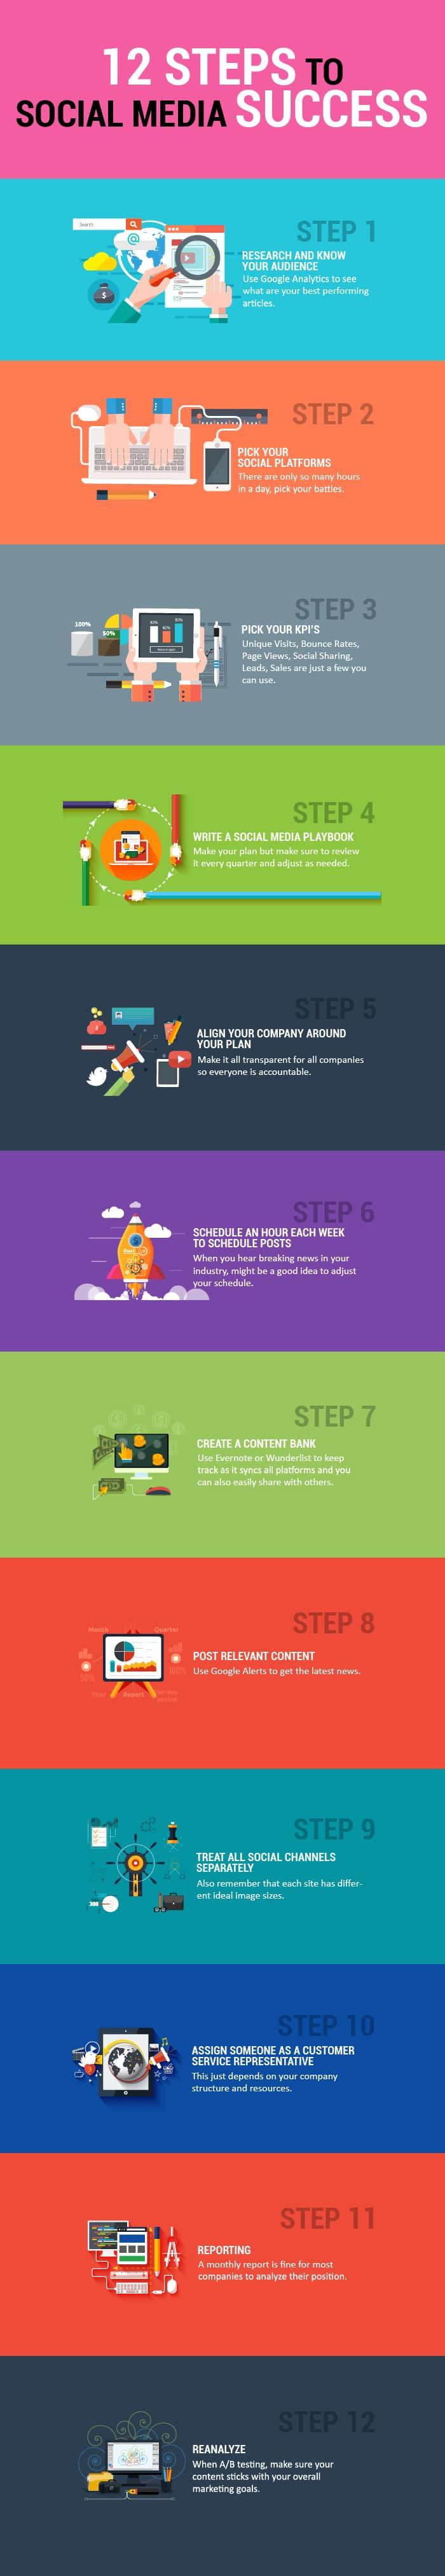 Infographic: Social Media Marketing Success